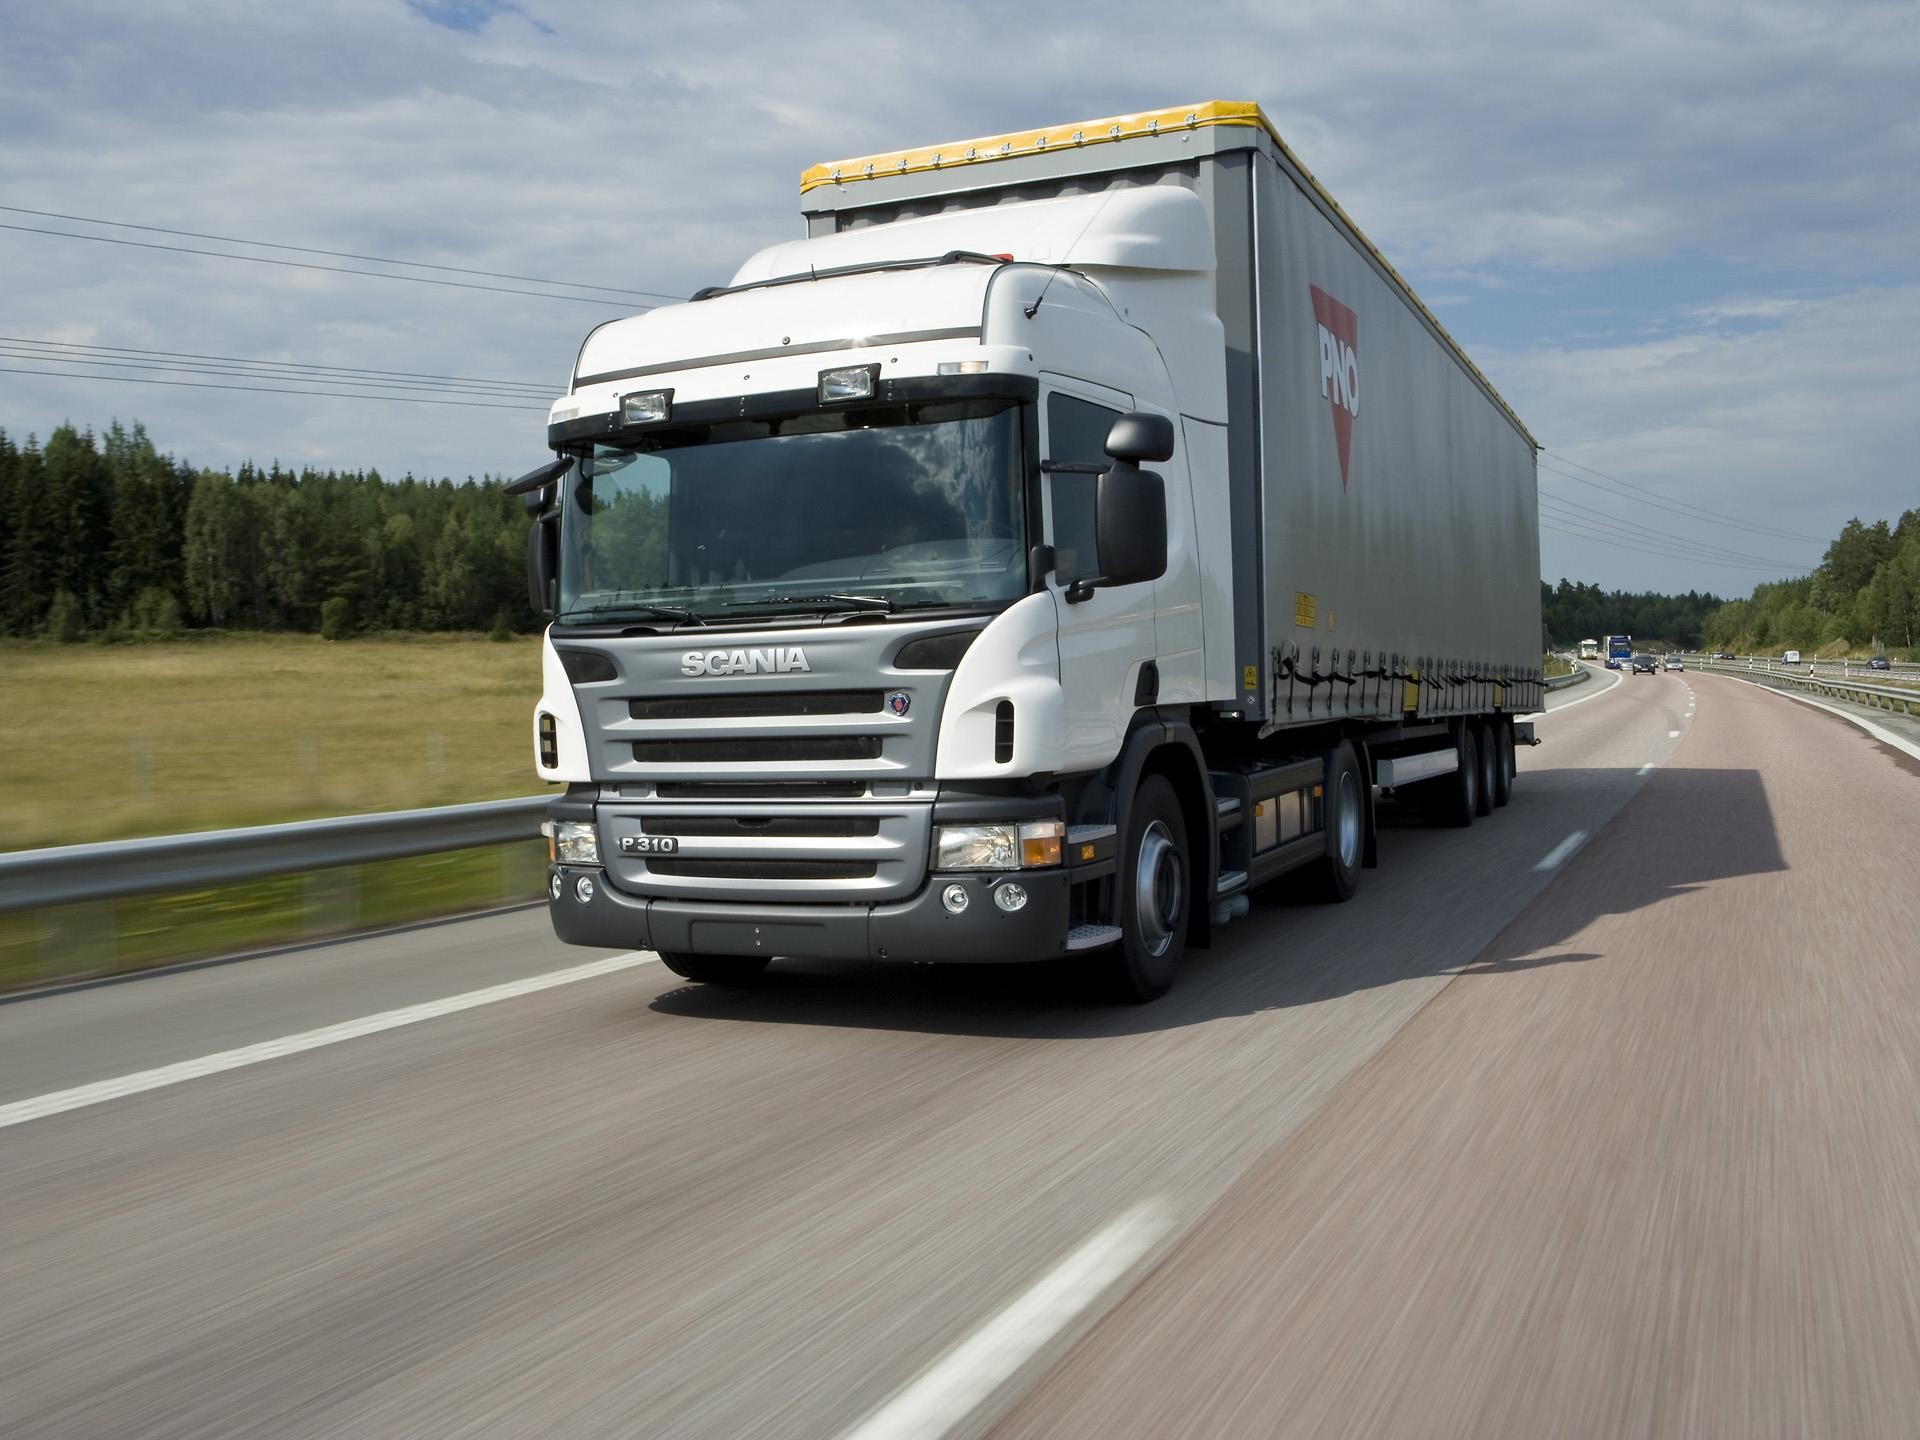 Scania P-Series | A TruckLocator Review | Truck Locator Blog